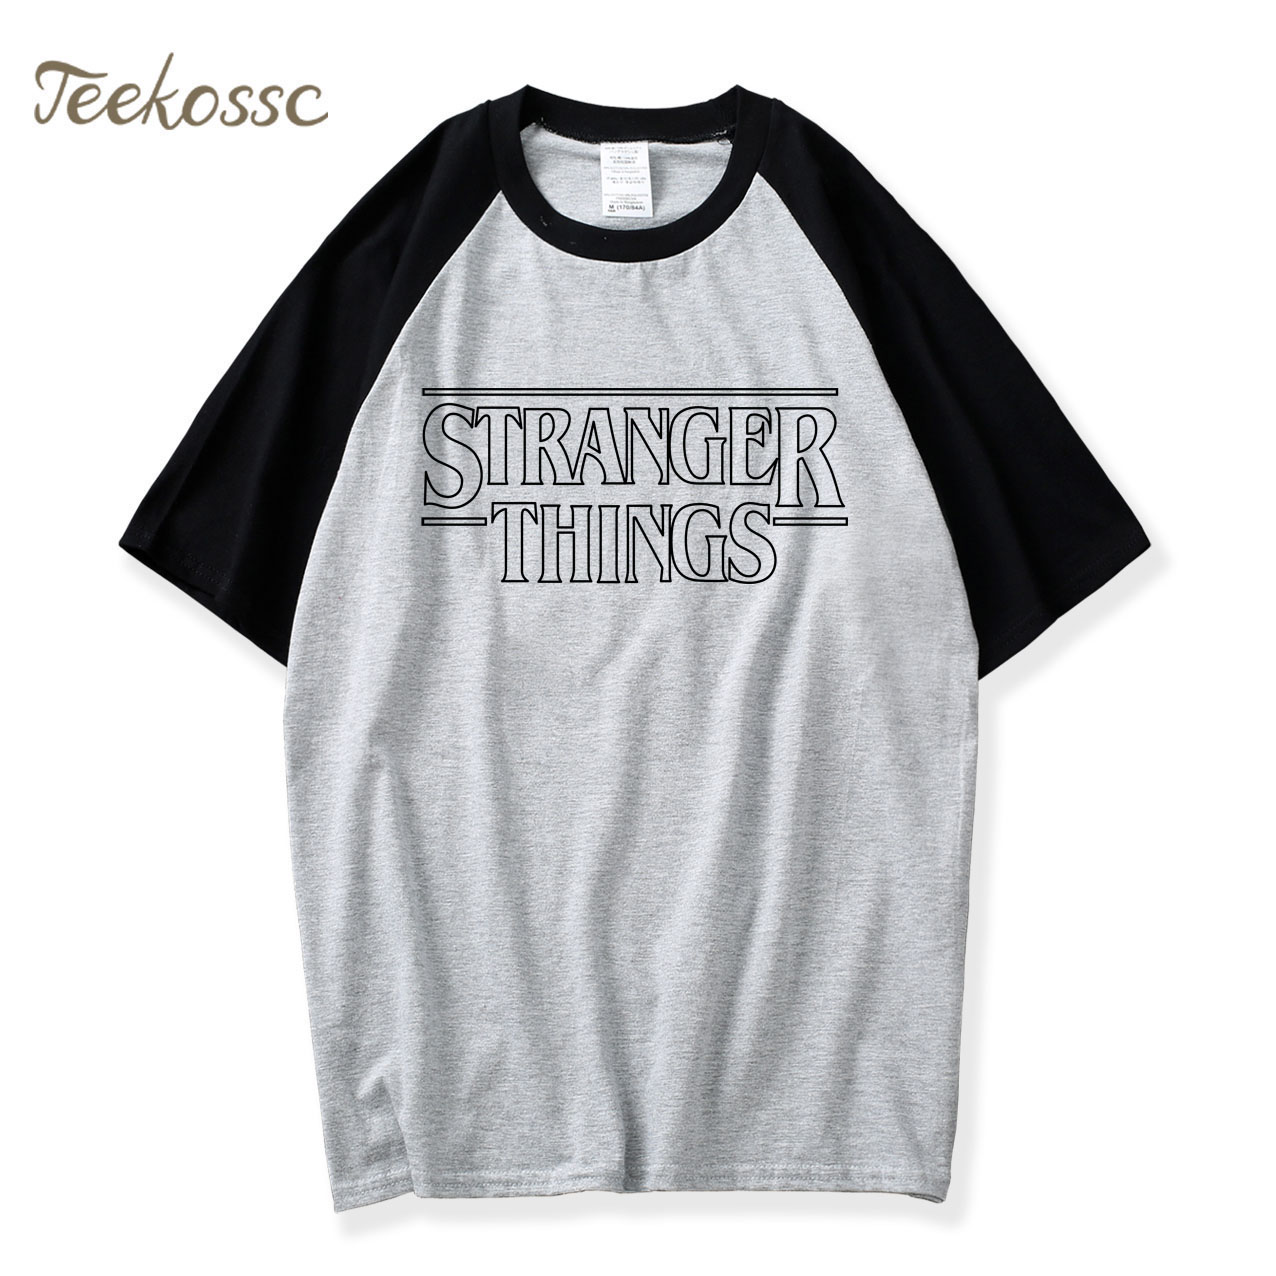 Letter Printed Tshirt TV Show Short Sleeve 2018 Hot Sale Summer Fashion Raglan T Shirt Men 100% Cotton O-neck Tops Men's T-Shirt